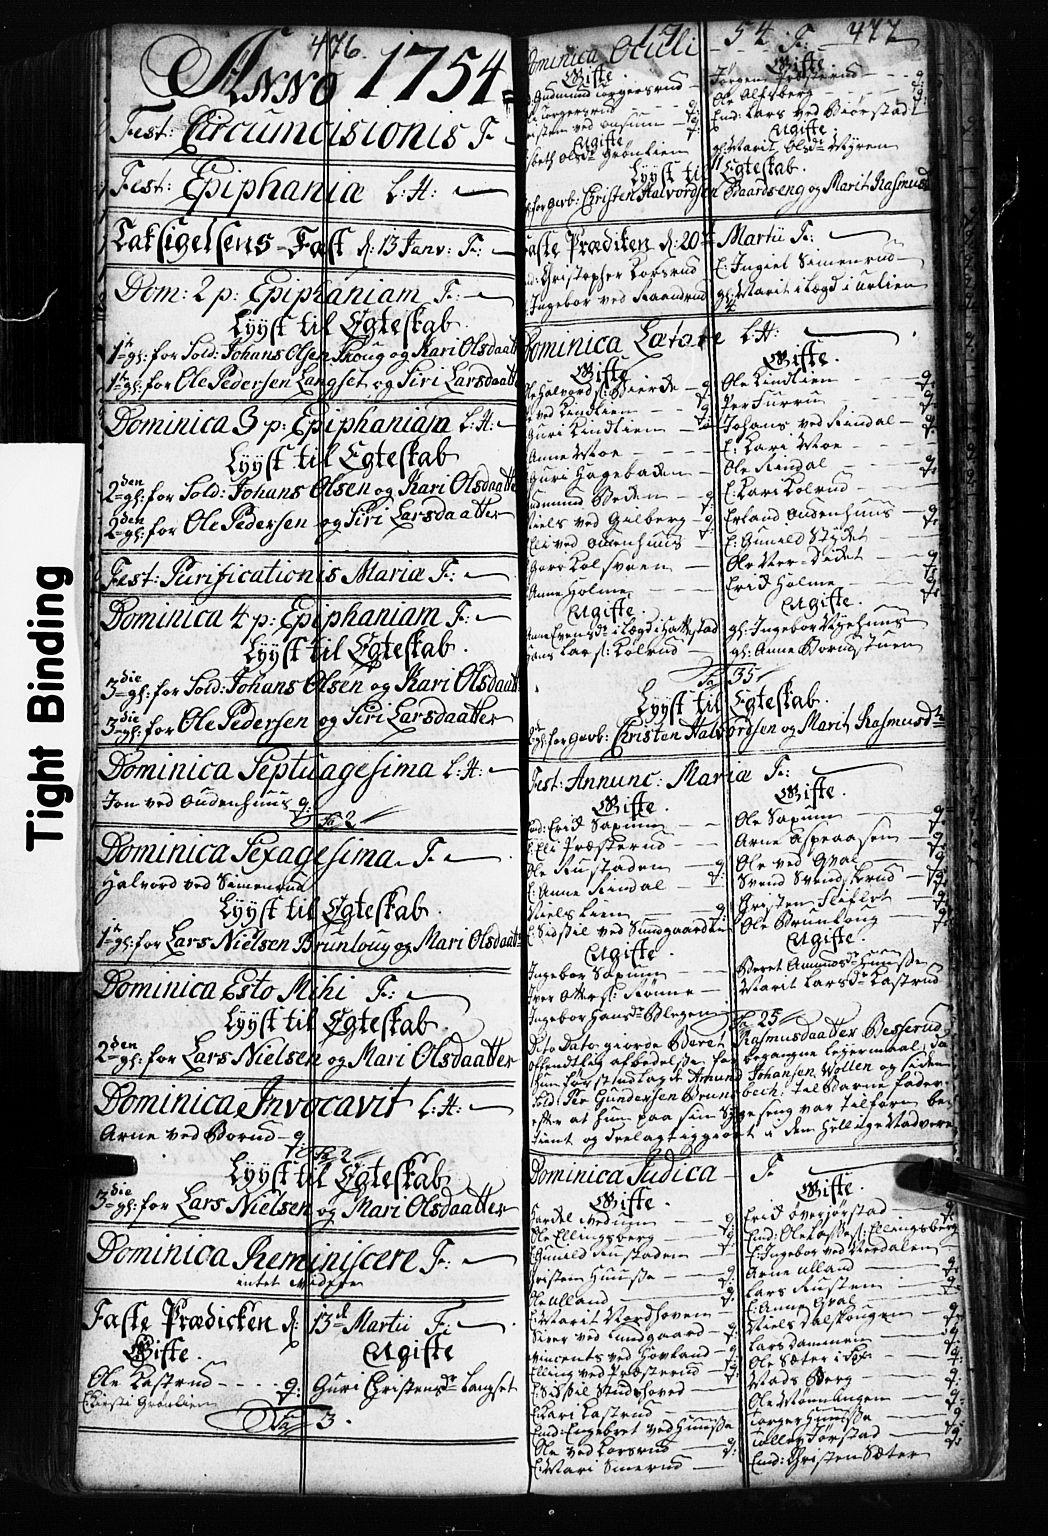 SAH, Fåberg prestekontor, Klokkerbok nr. 2, 1741-1756, s. 476-477